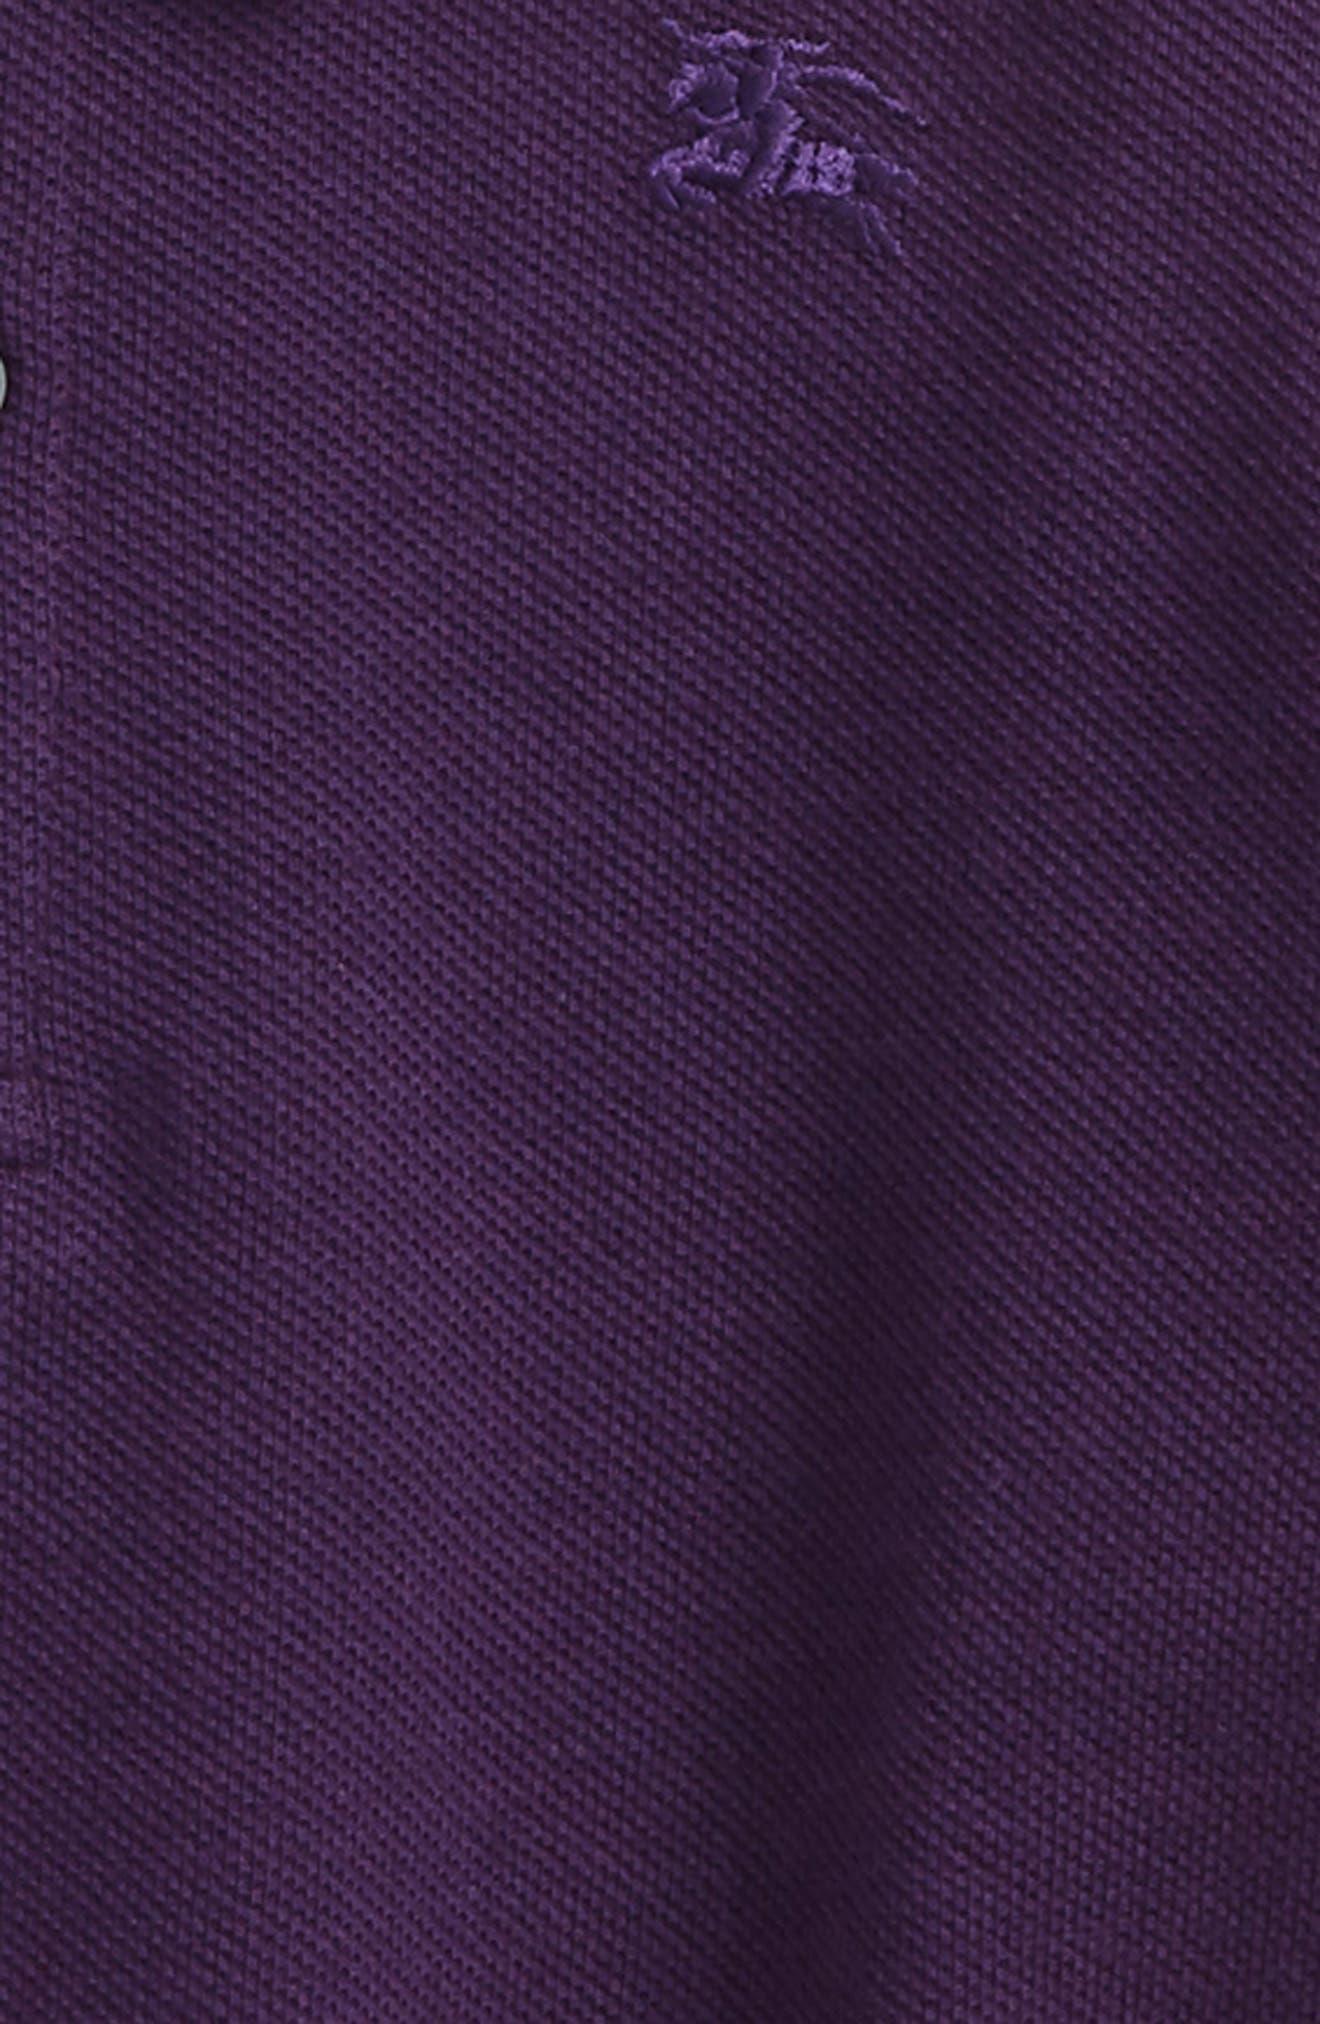 Palmer Piqué Polo,                             Alternate thumbnail 2, color,                             Purple Grape